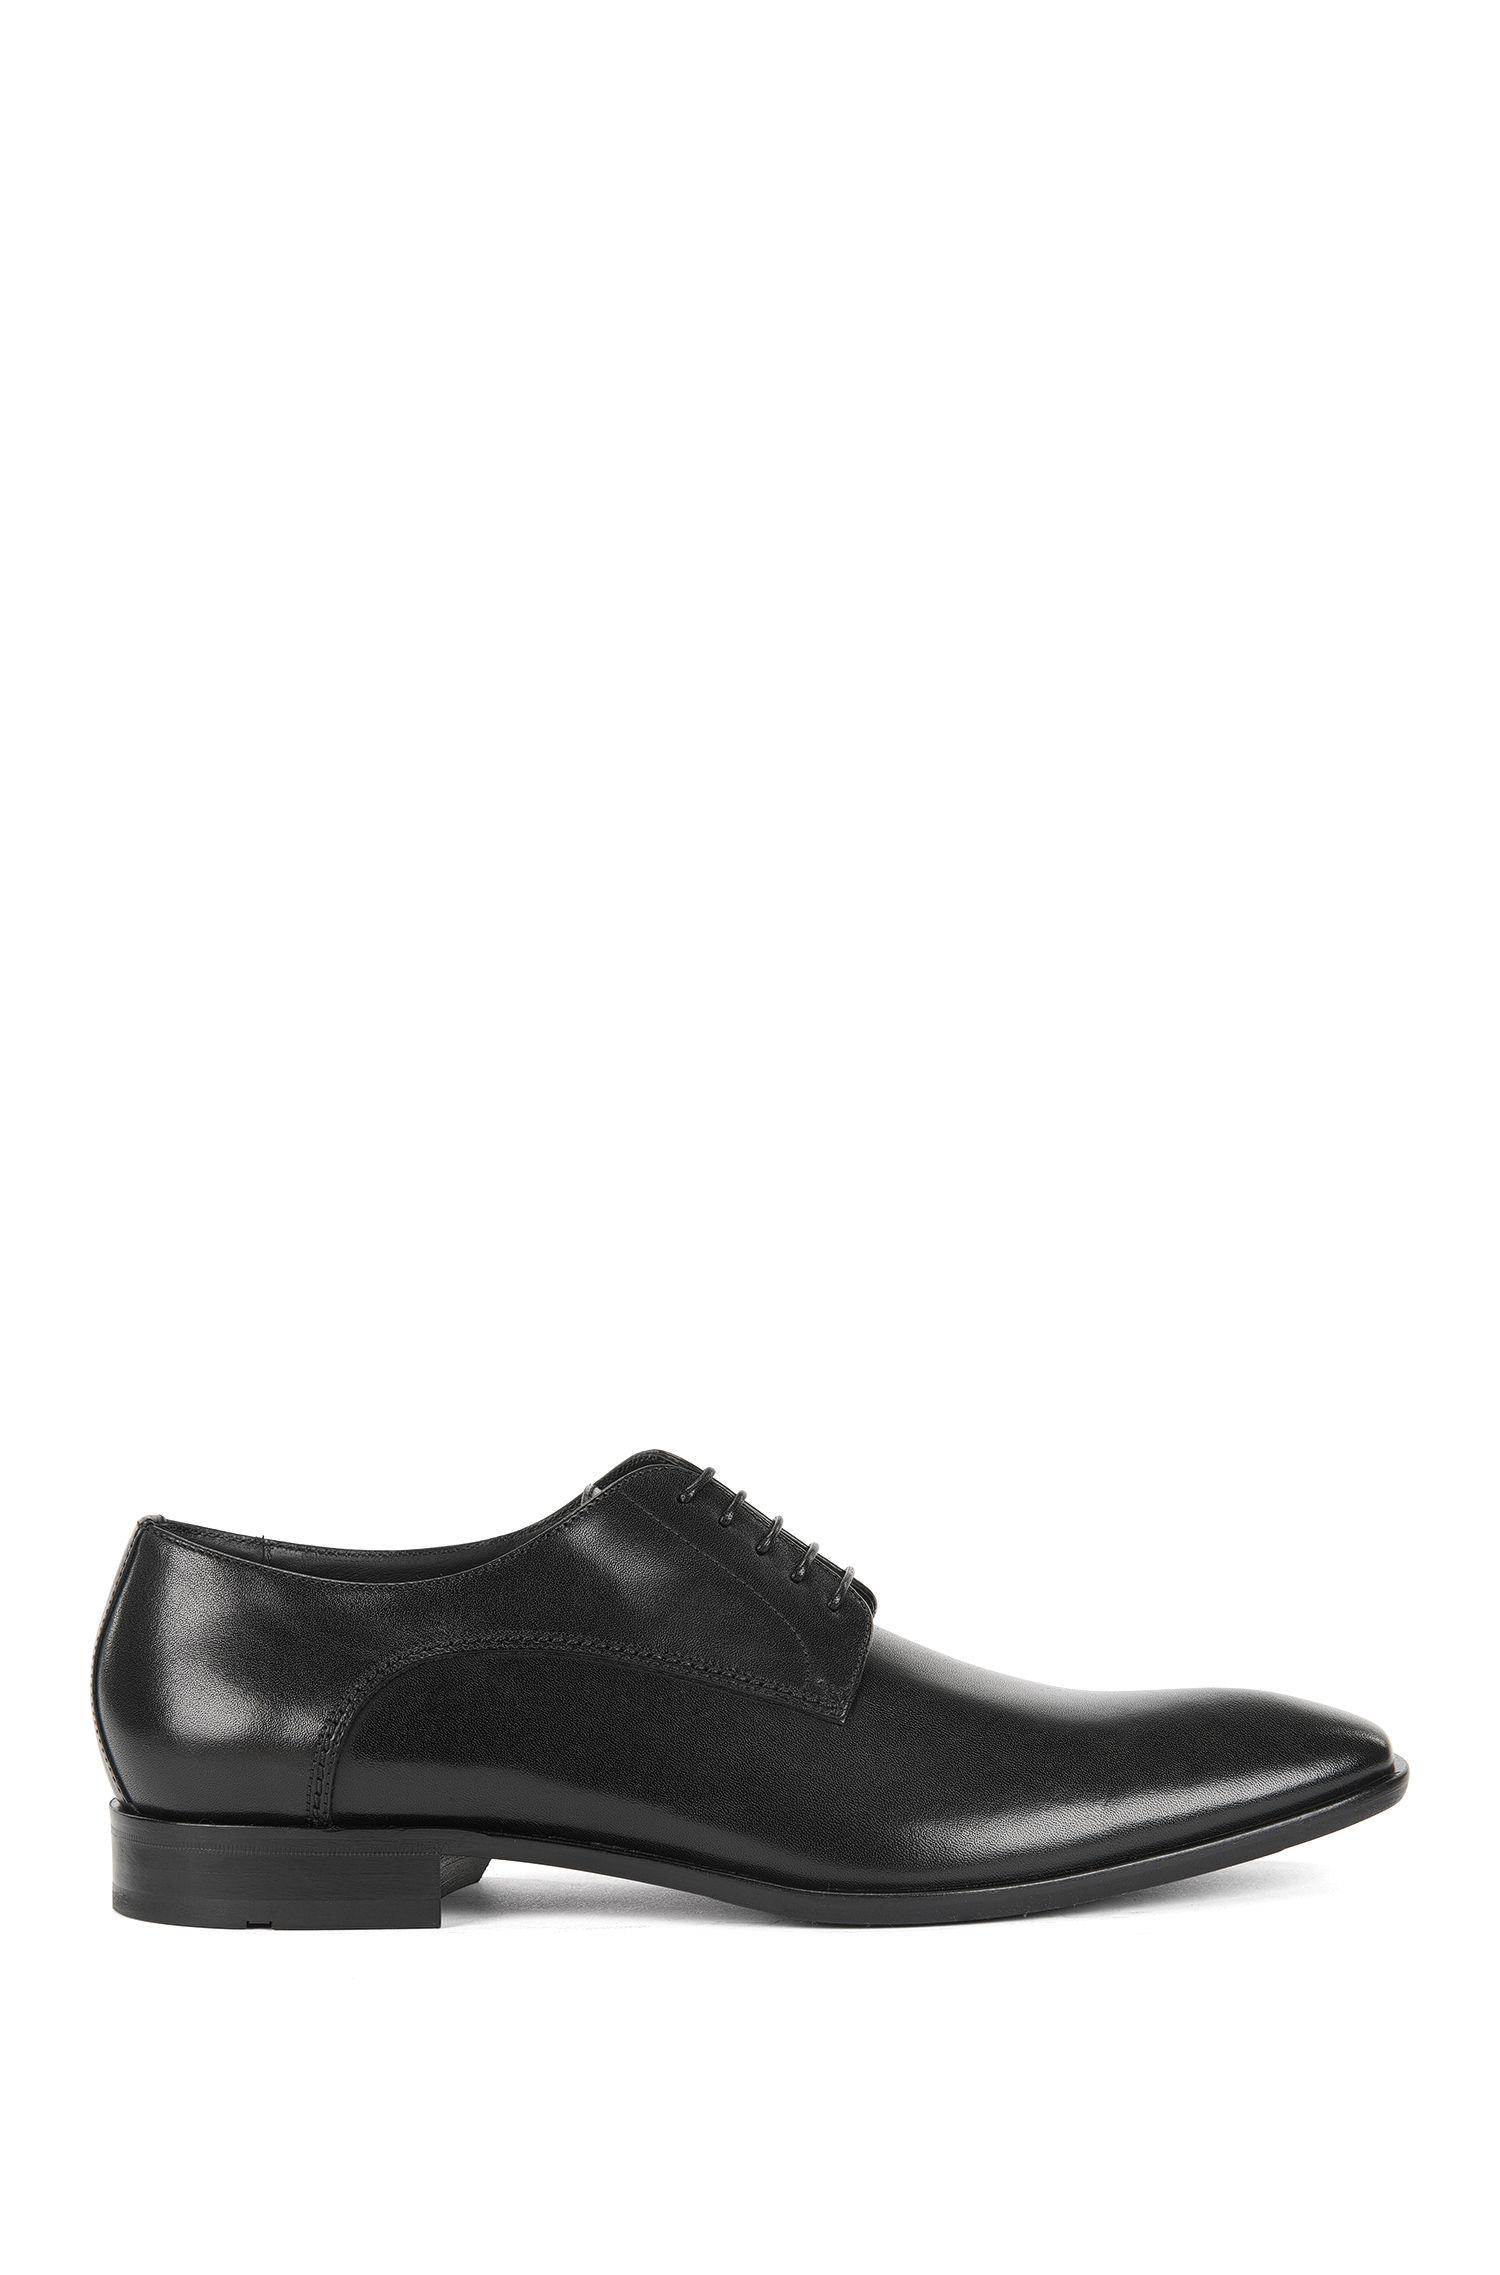 Leather Derby Dress Shoe | Carmons